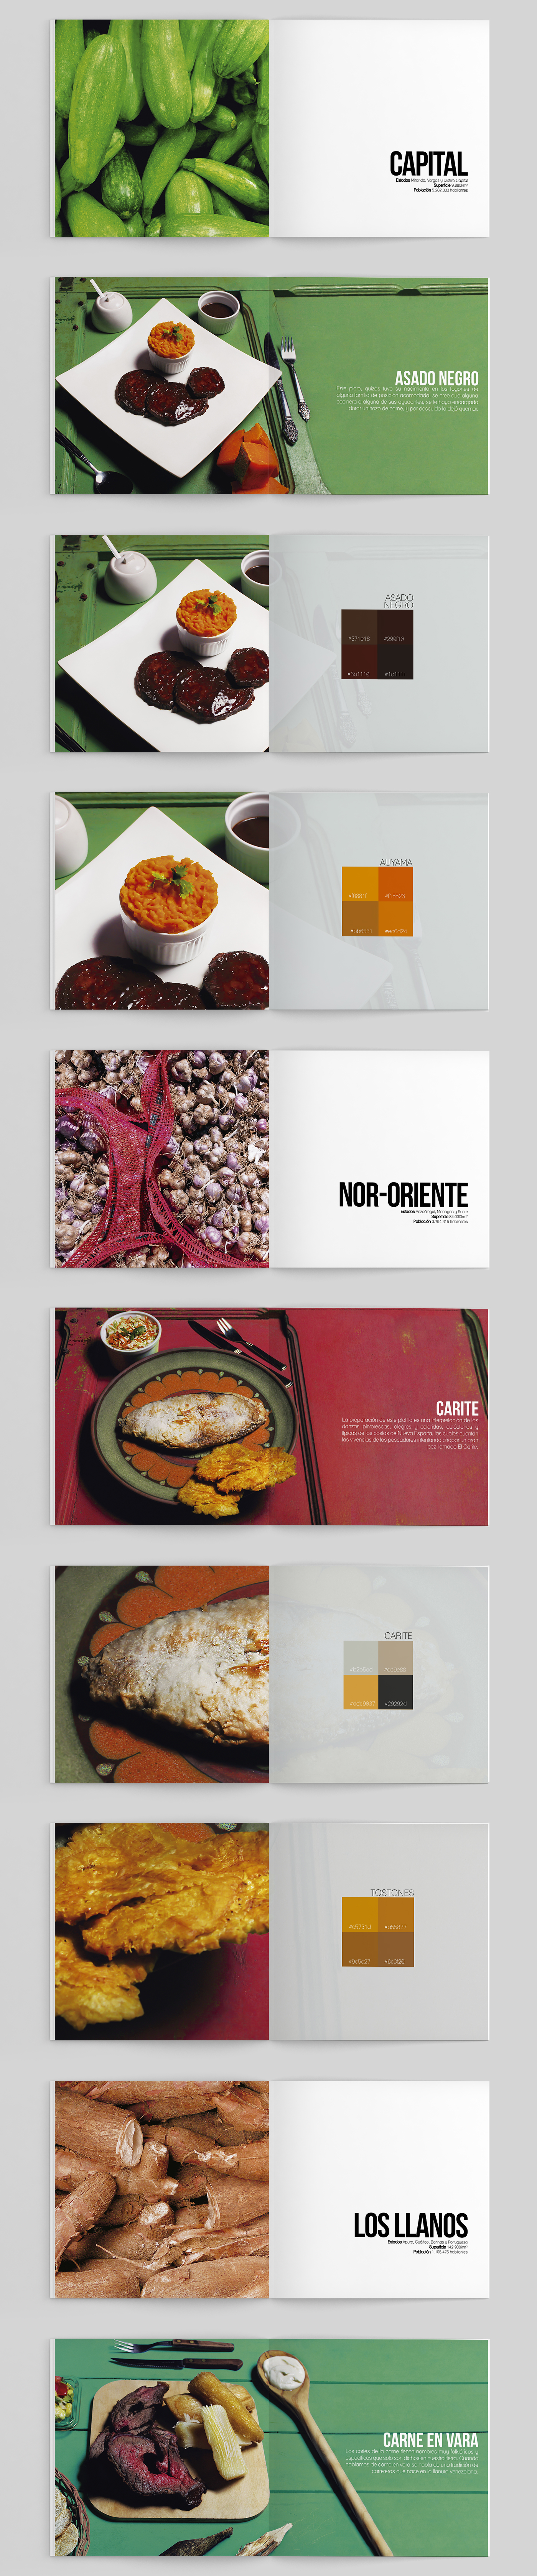 Food  color colorblocking book editorial